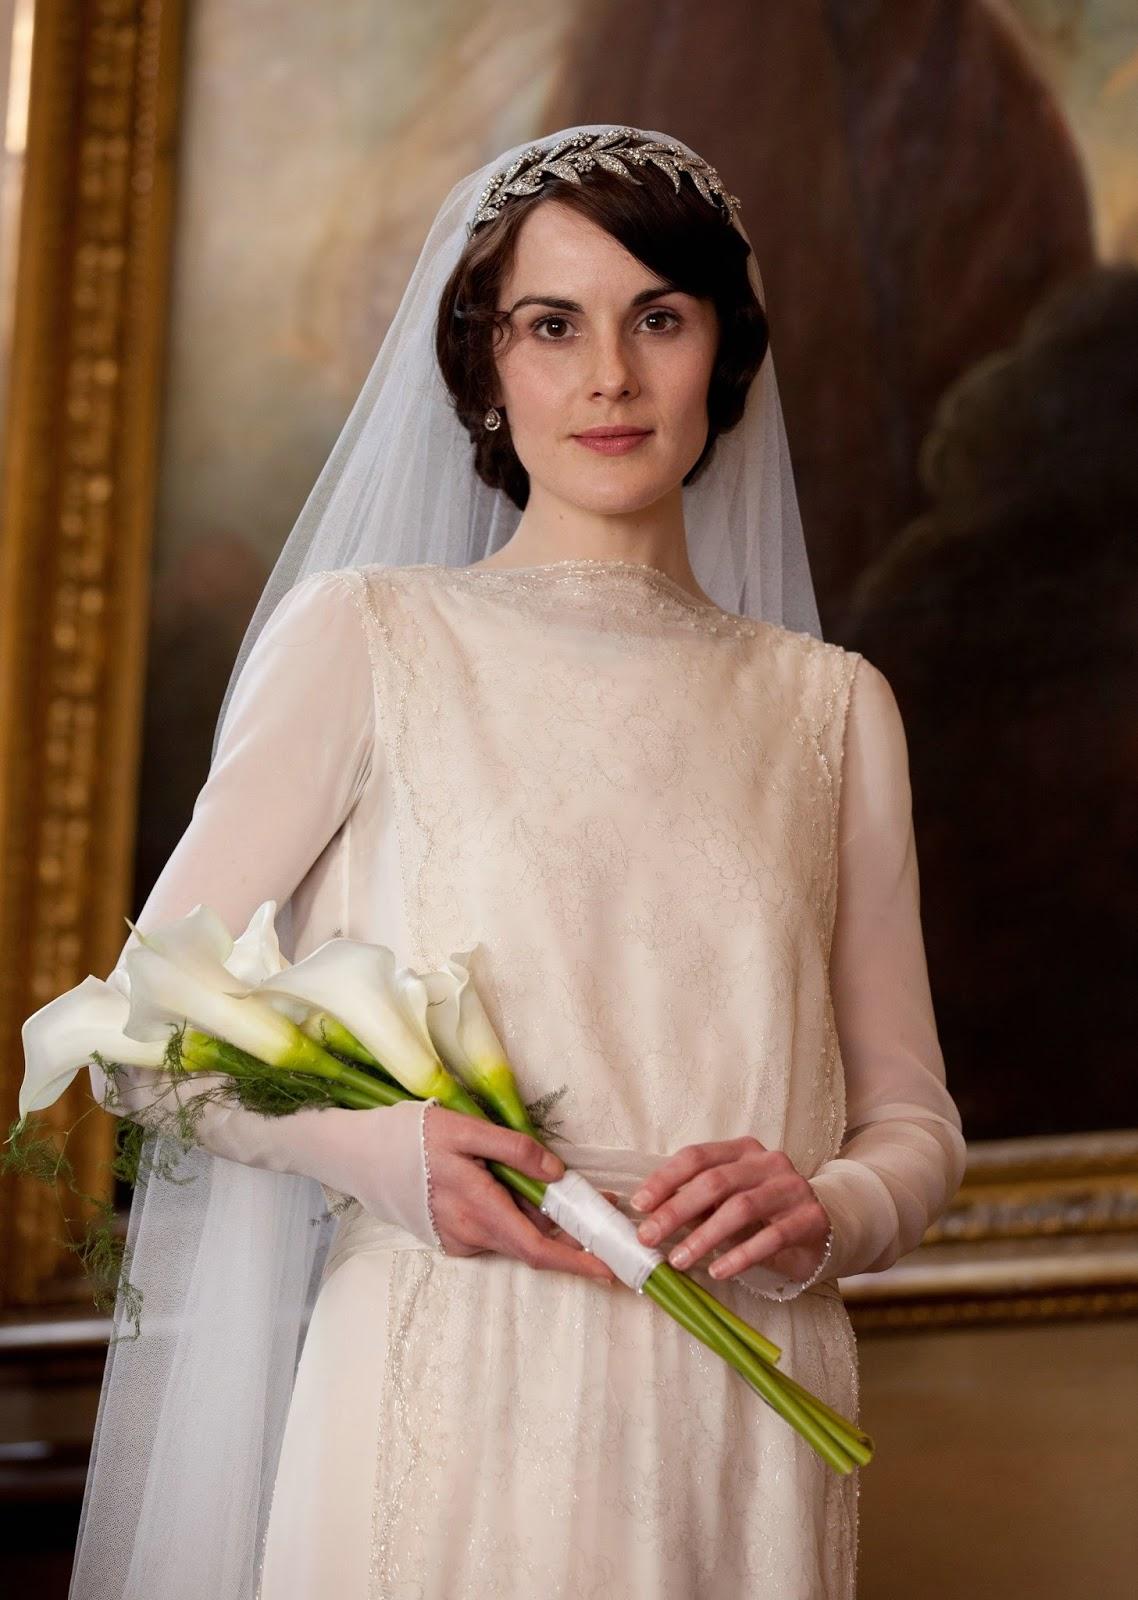 DressyBridal Marrys Long Sleeved Wedding Dress Downton Abbeys Fashion Chapter 1